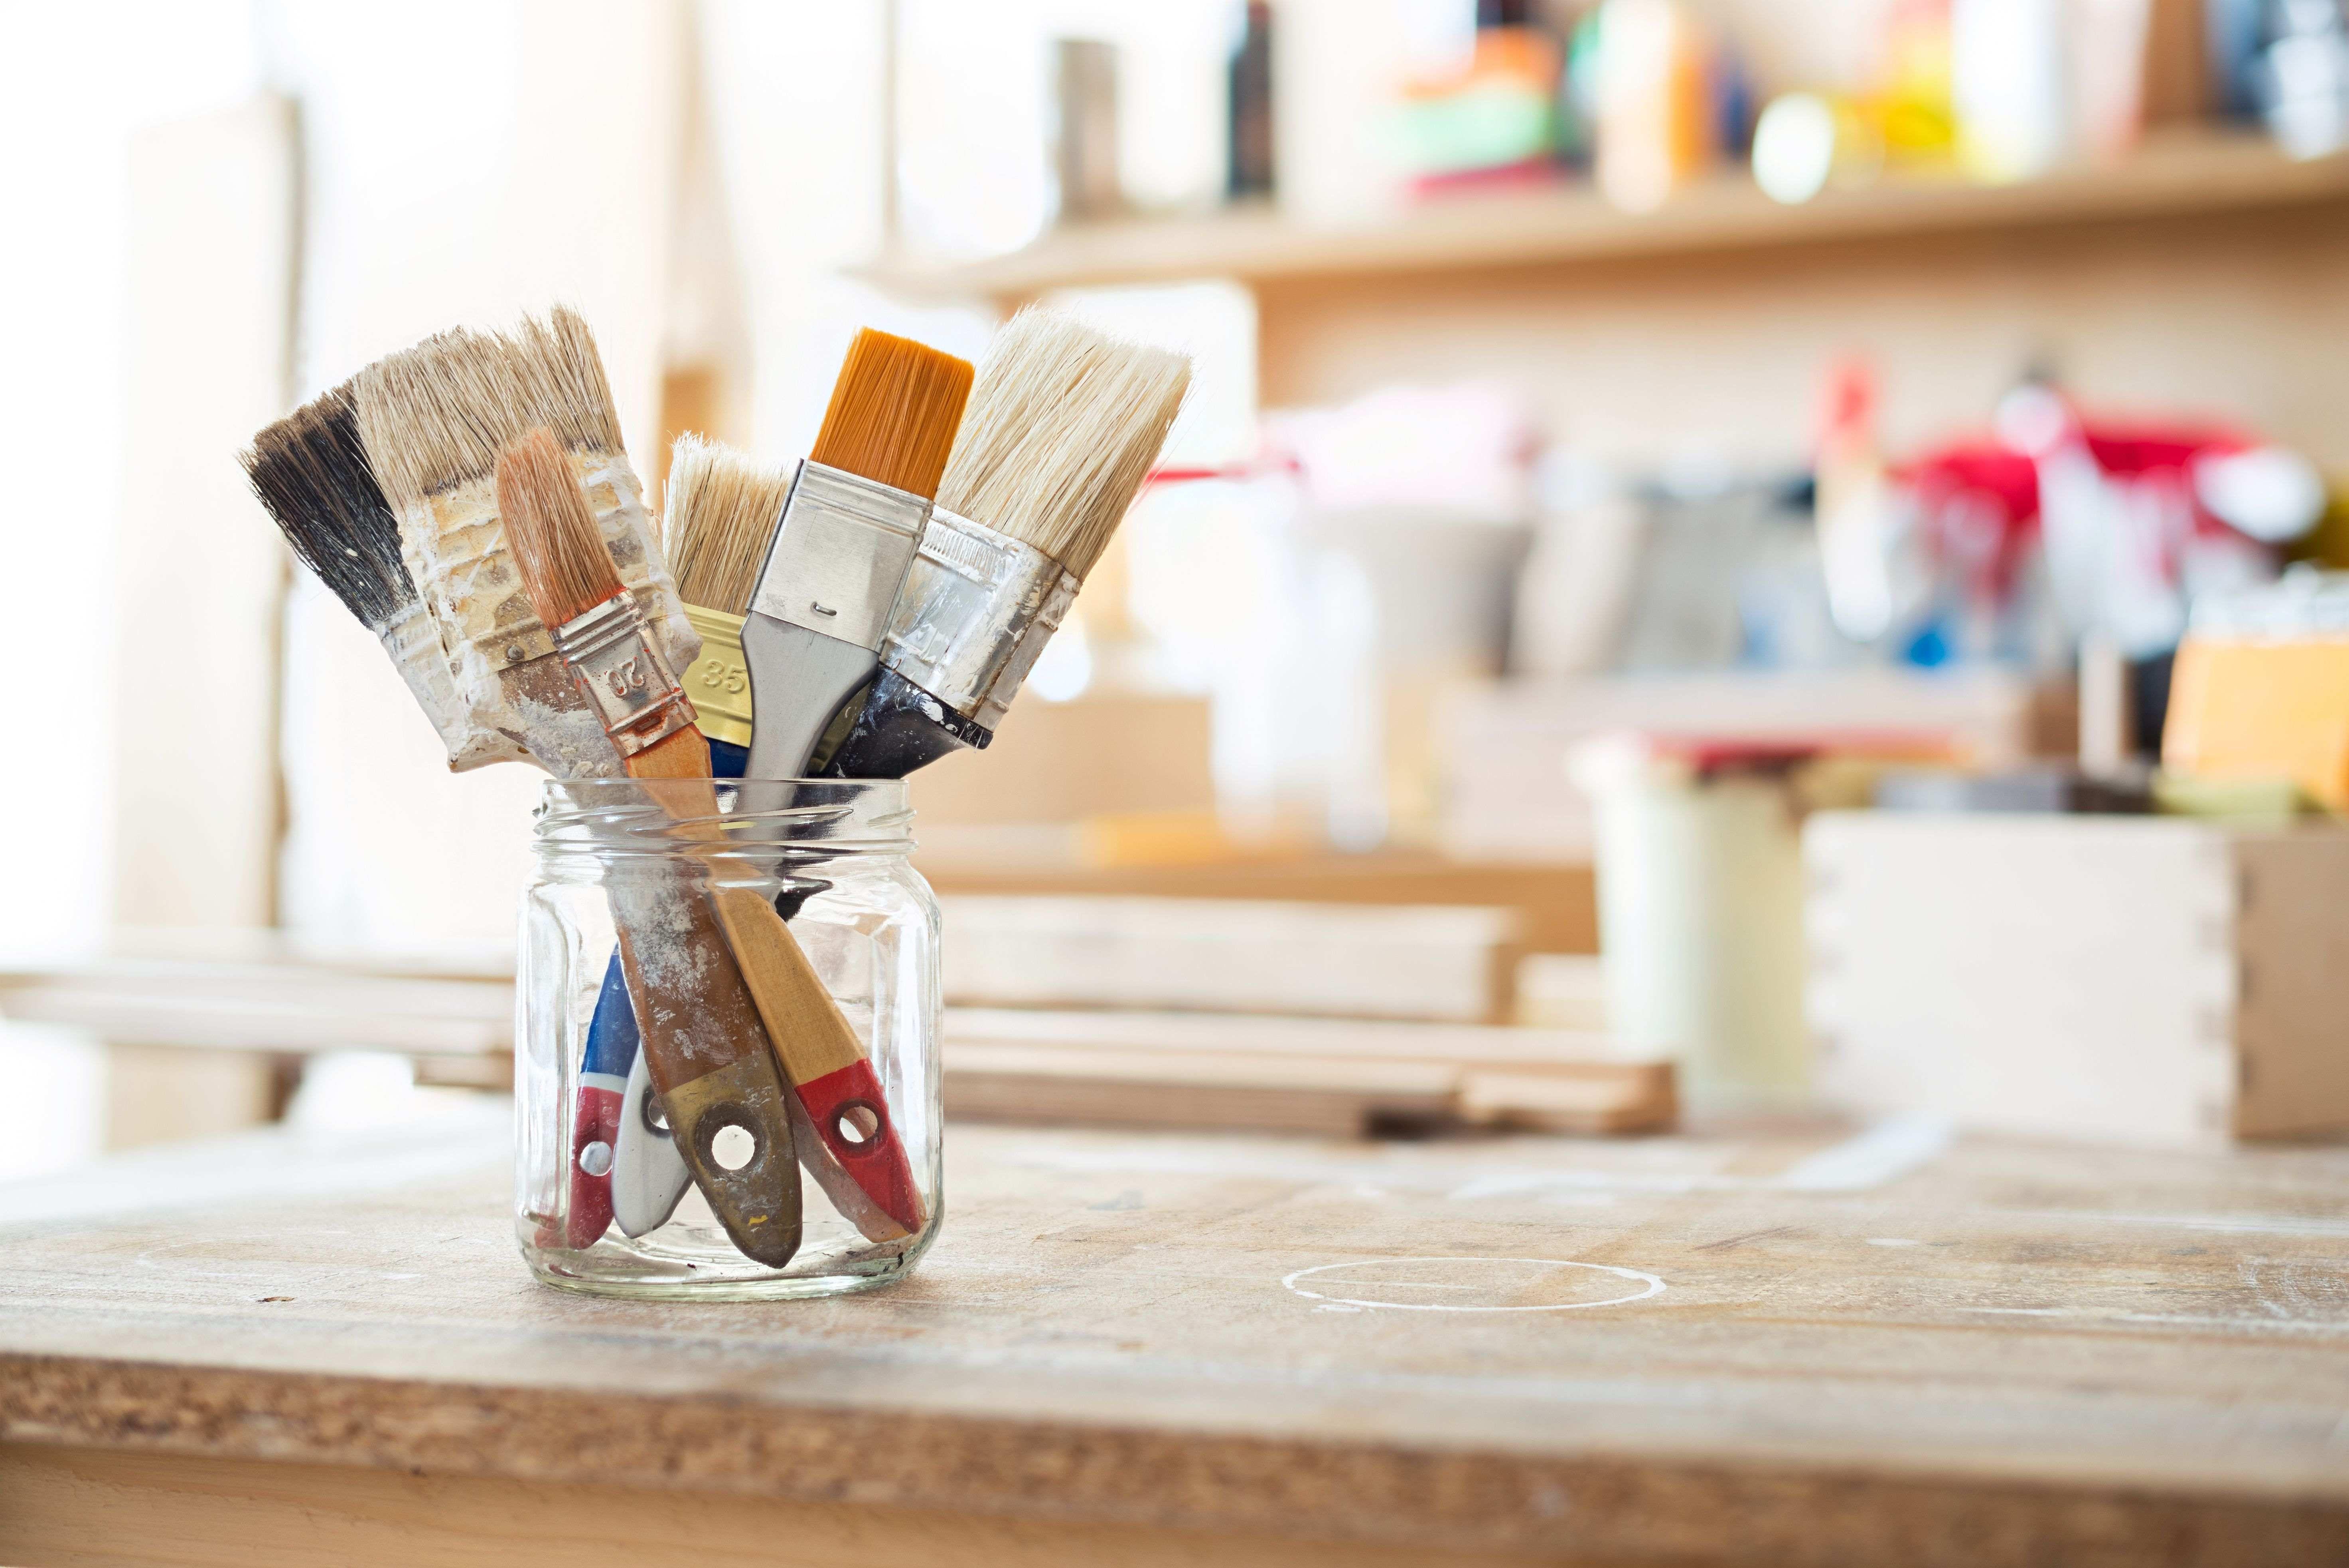 Paint brush buying guide